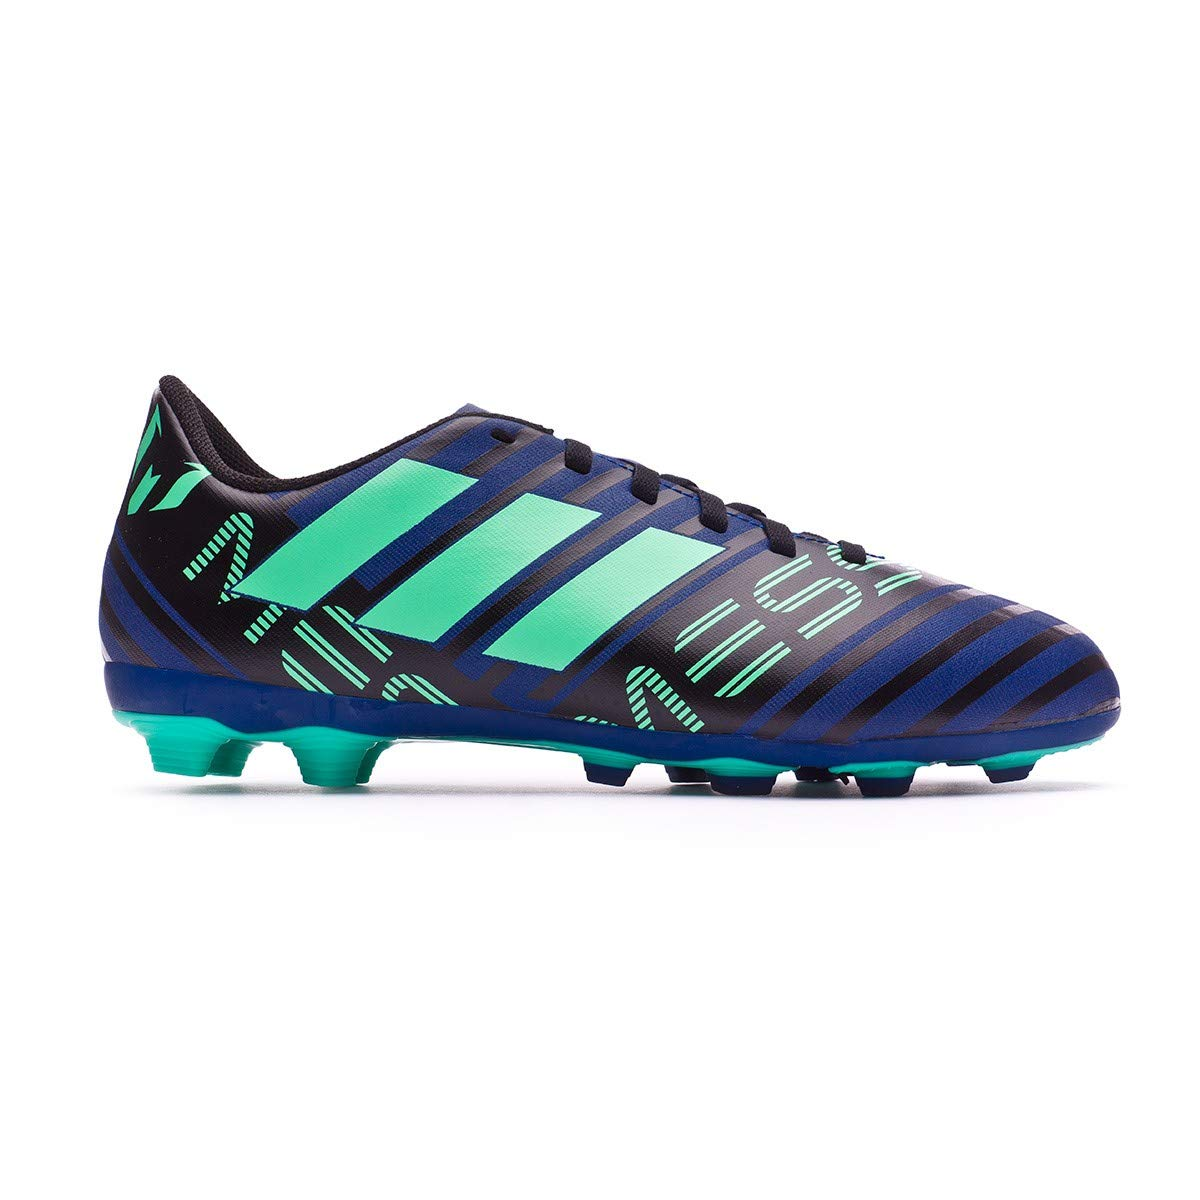 Adidas Unisex-Kinder Nemeziz Messi 17.4 Fxg Jr Cp9212 Fußballschuhe